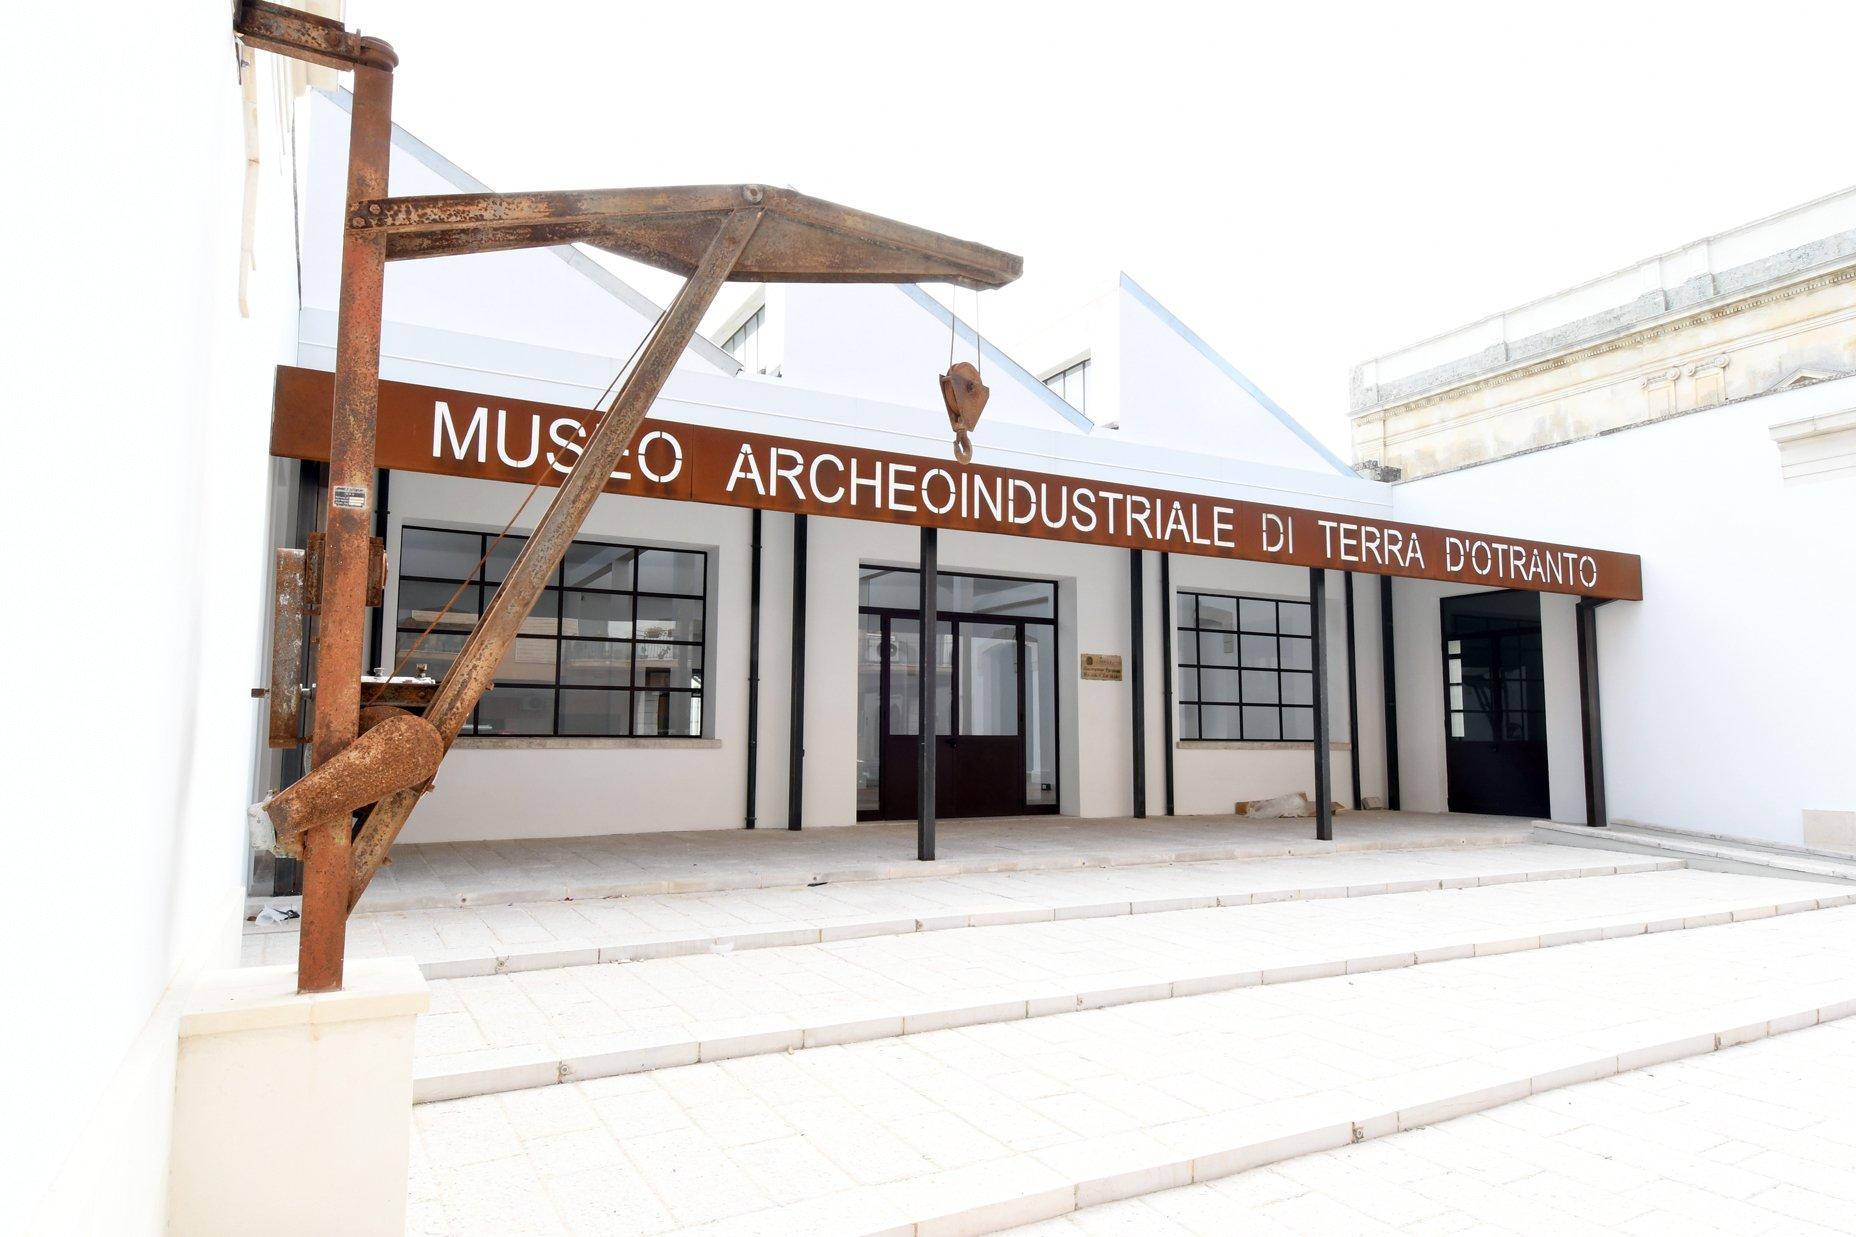 Da fabbrica a Museo archeoindustriale di Terra d'Otranto. Accade a Maglie